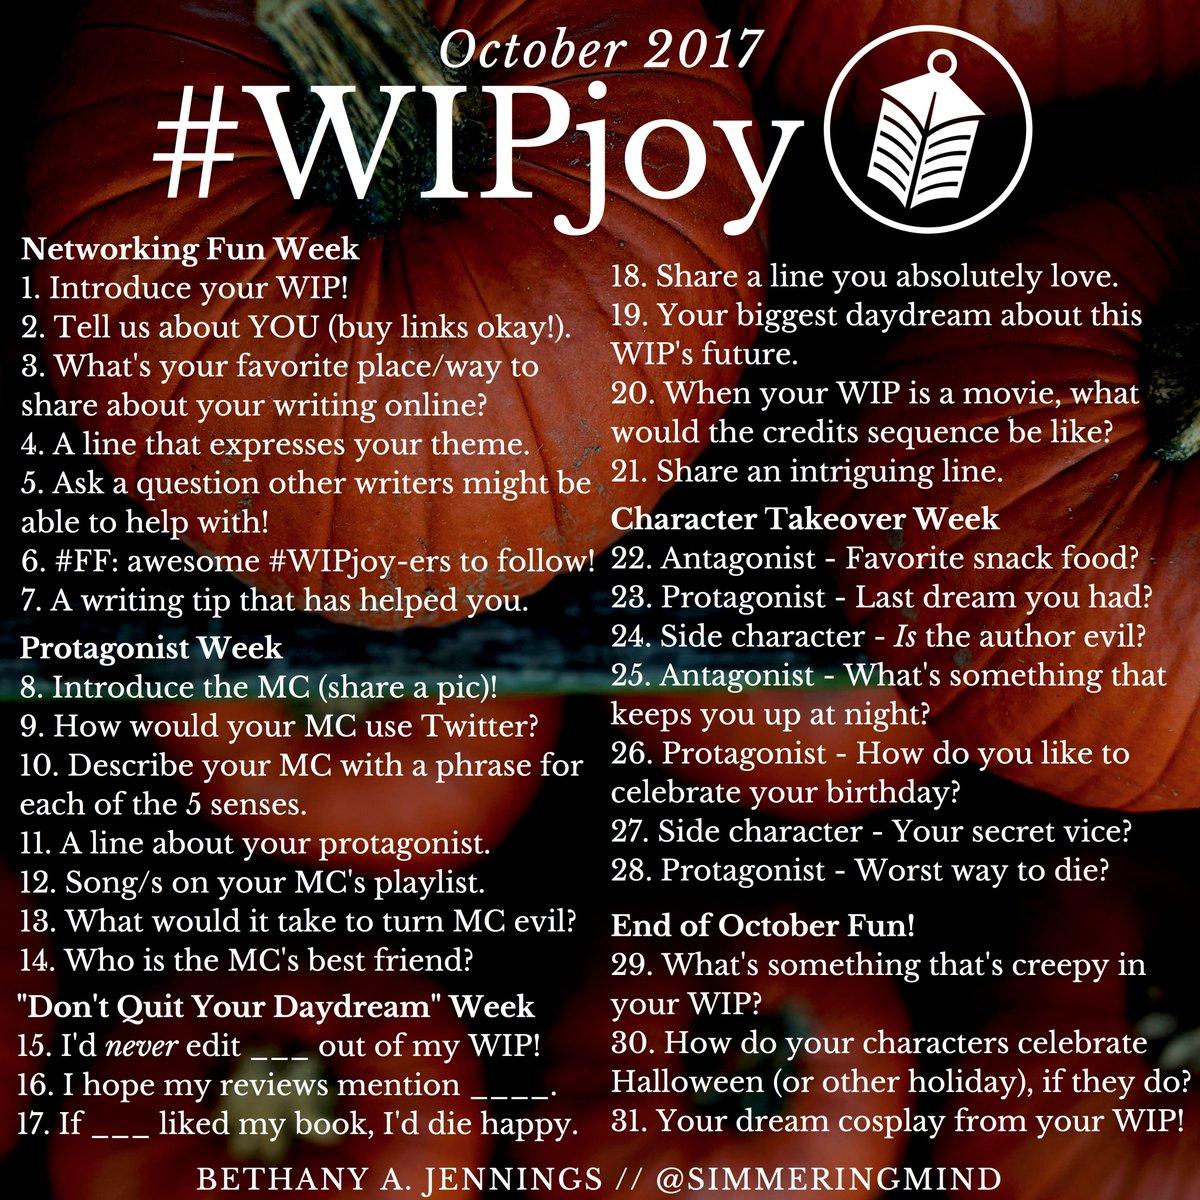 #WIPjoy - Oct 2017